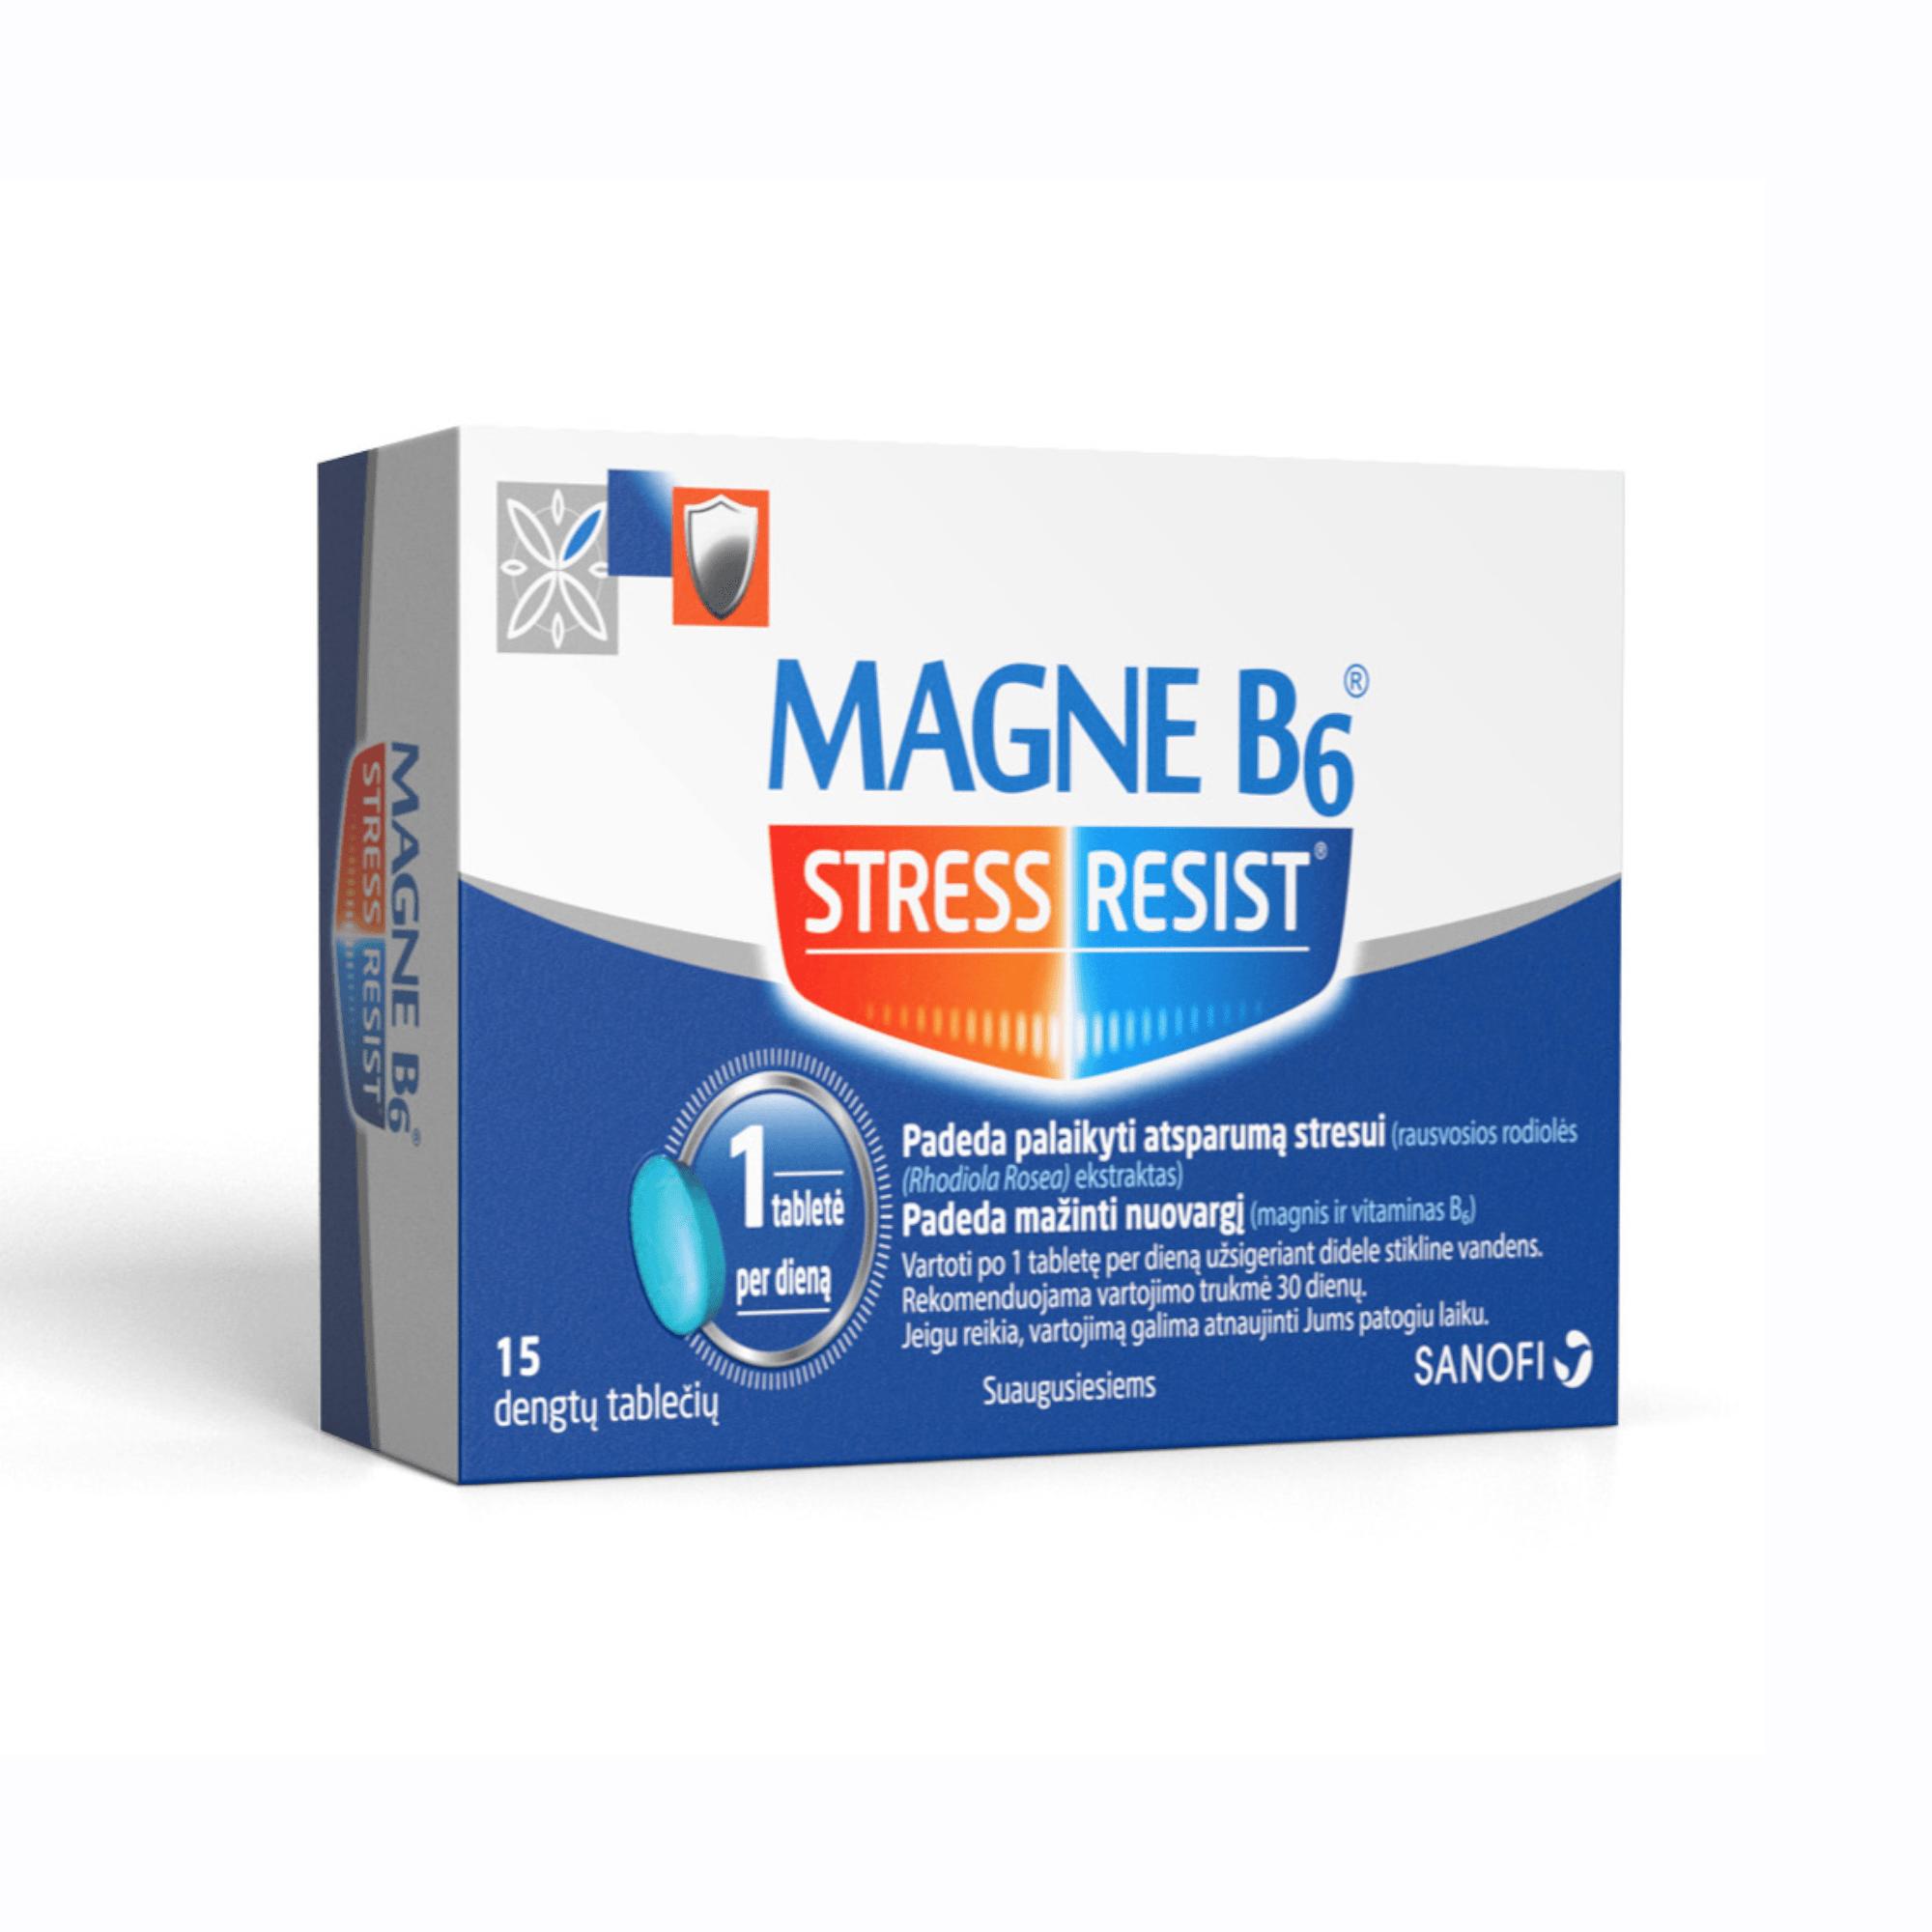 magne b6 nuo hipertenzijos